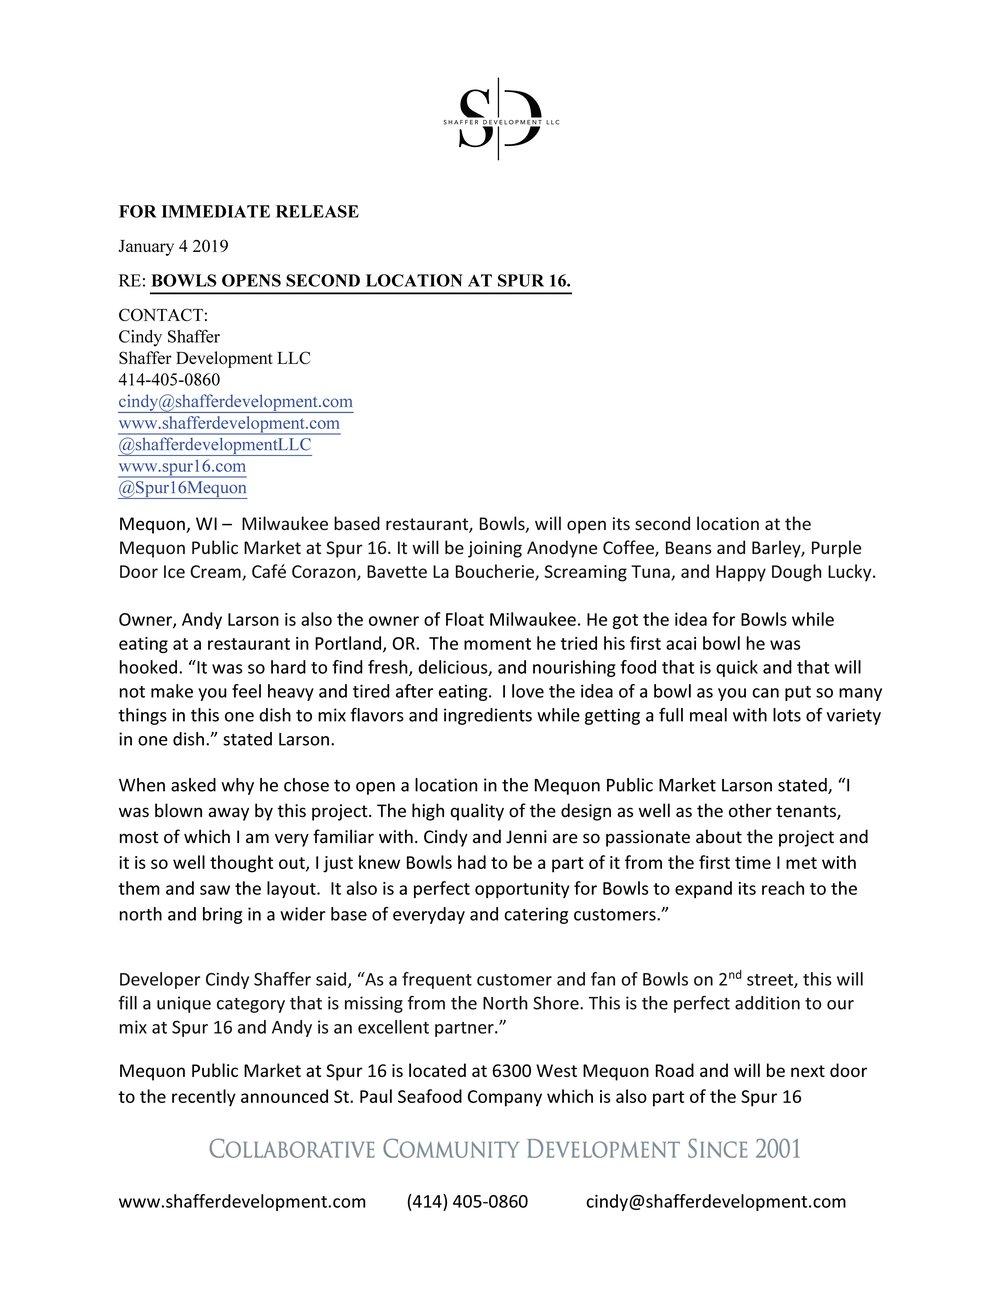 Bowls Press Release_Page_1.jpg